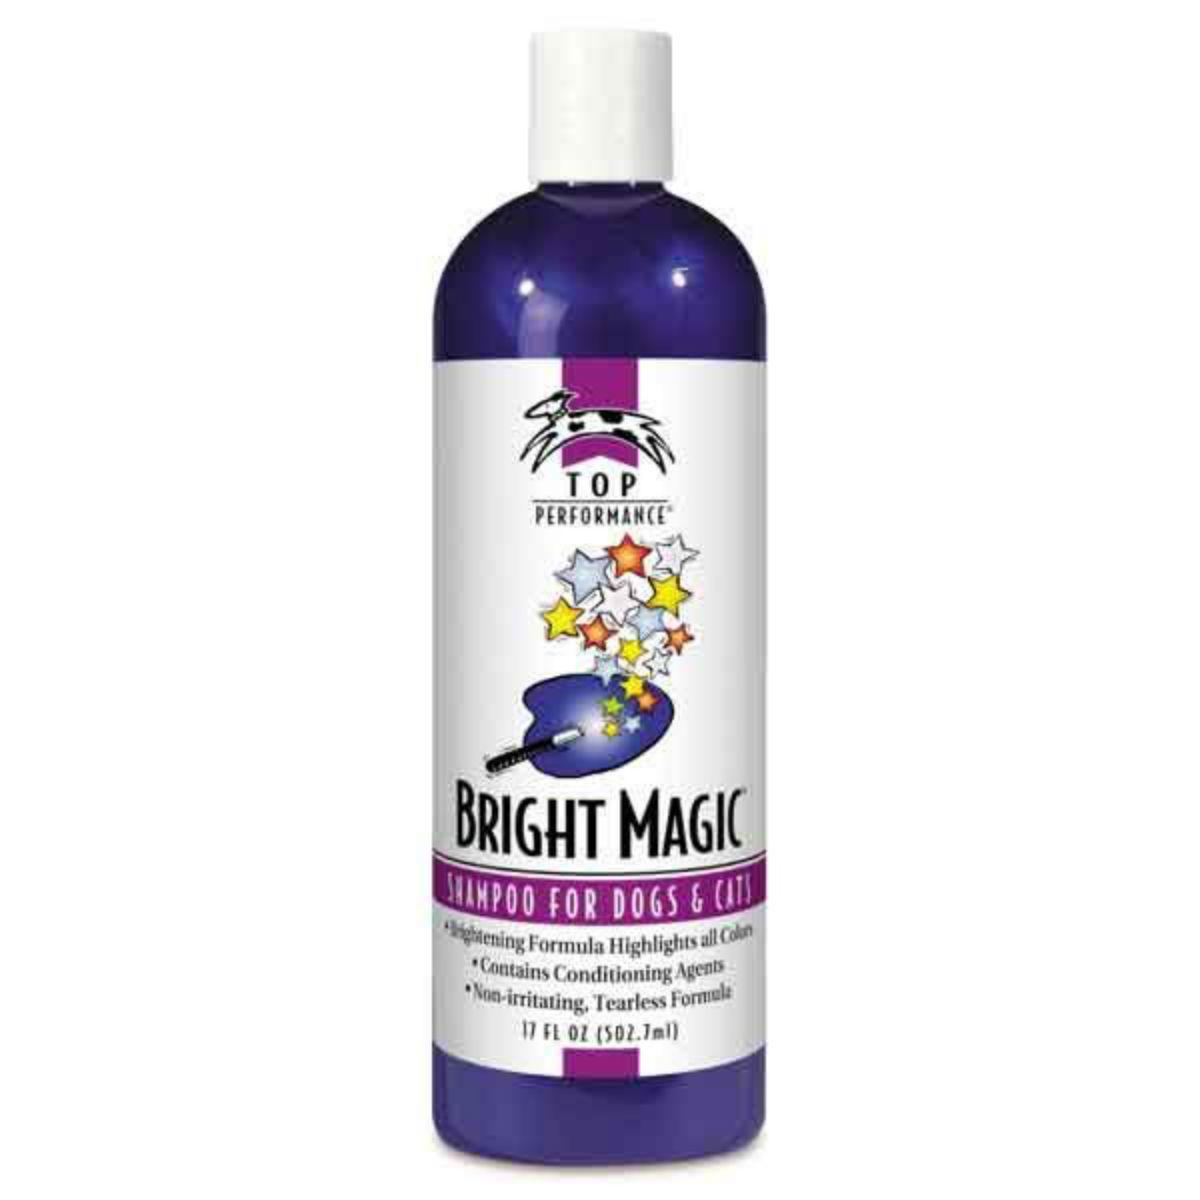 Top Performance Pet Shampoo - Bright Magic